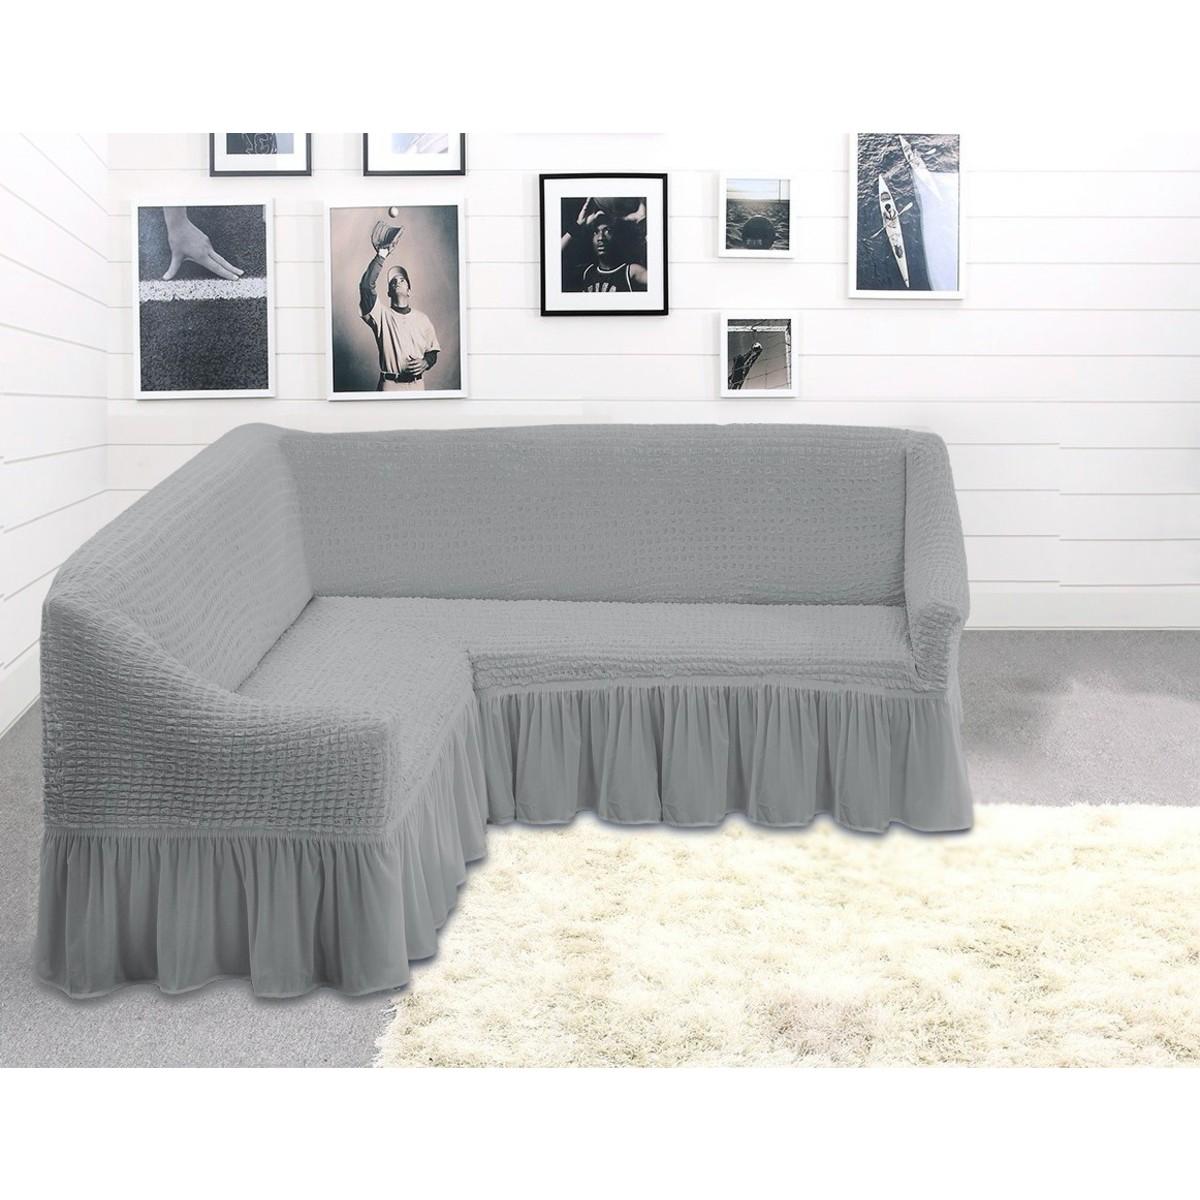 Чехол Для Мебели Texrepublic  Absolute 8839